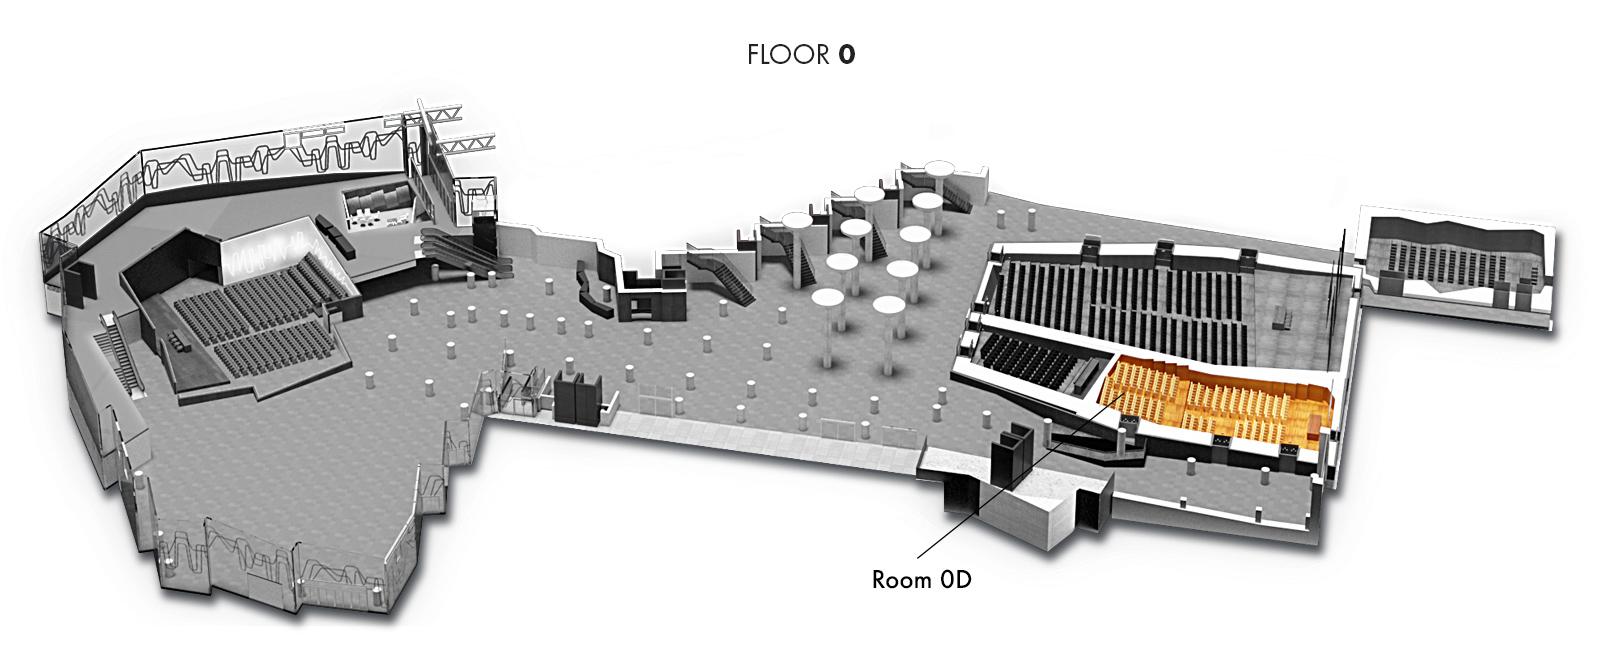 Room 0D, Floor 0   Palacio Euskalduna Jauregia